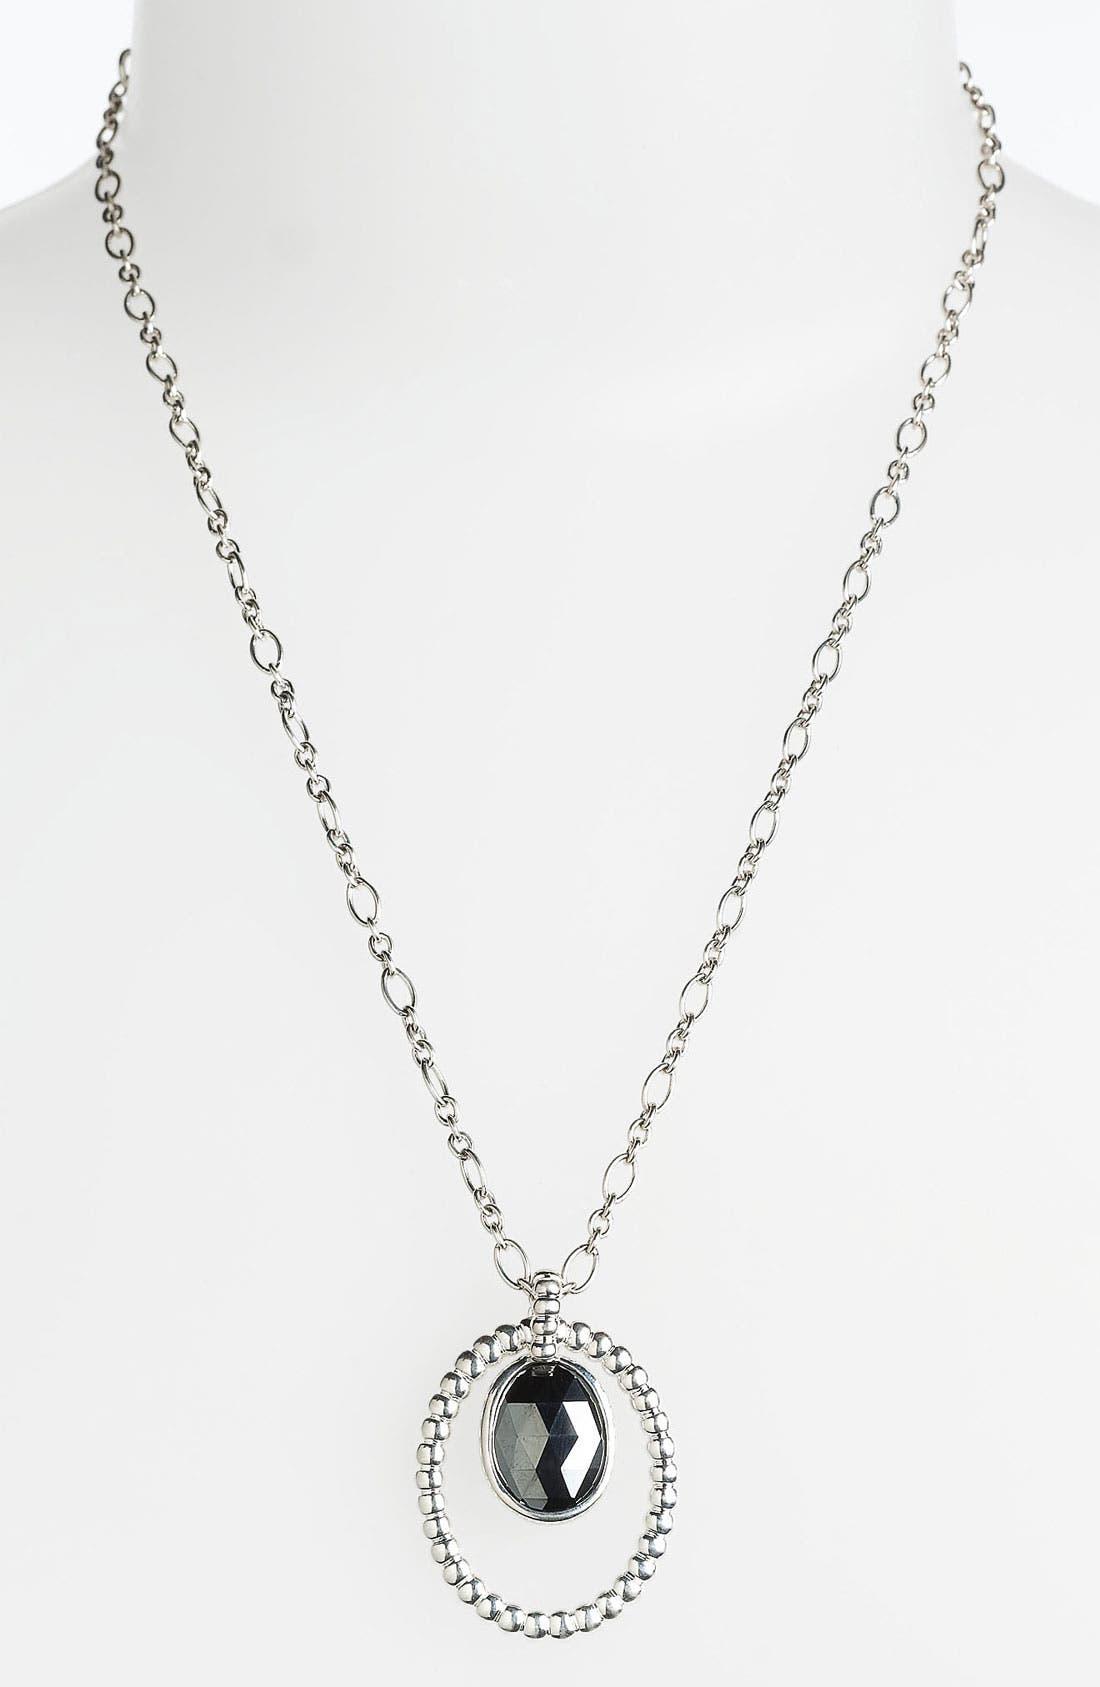 Alternate Image 1 Selected - John Hardy 'Bedeg' Oval Pendant Necklace